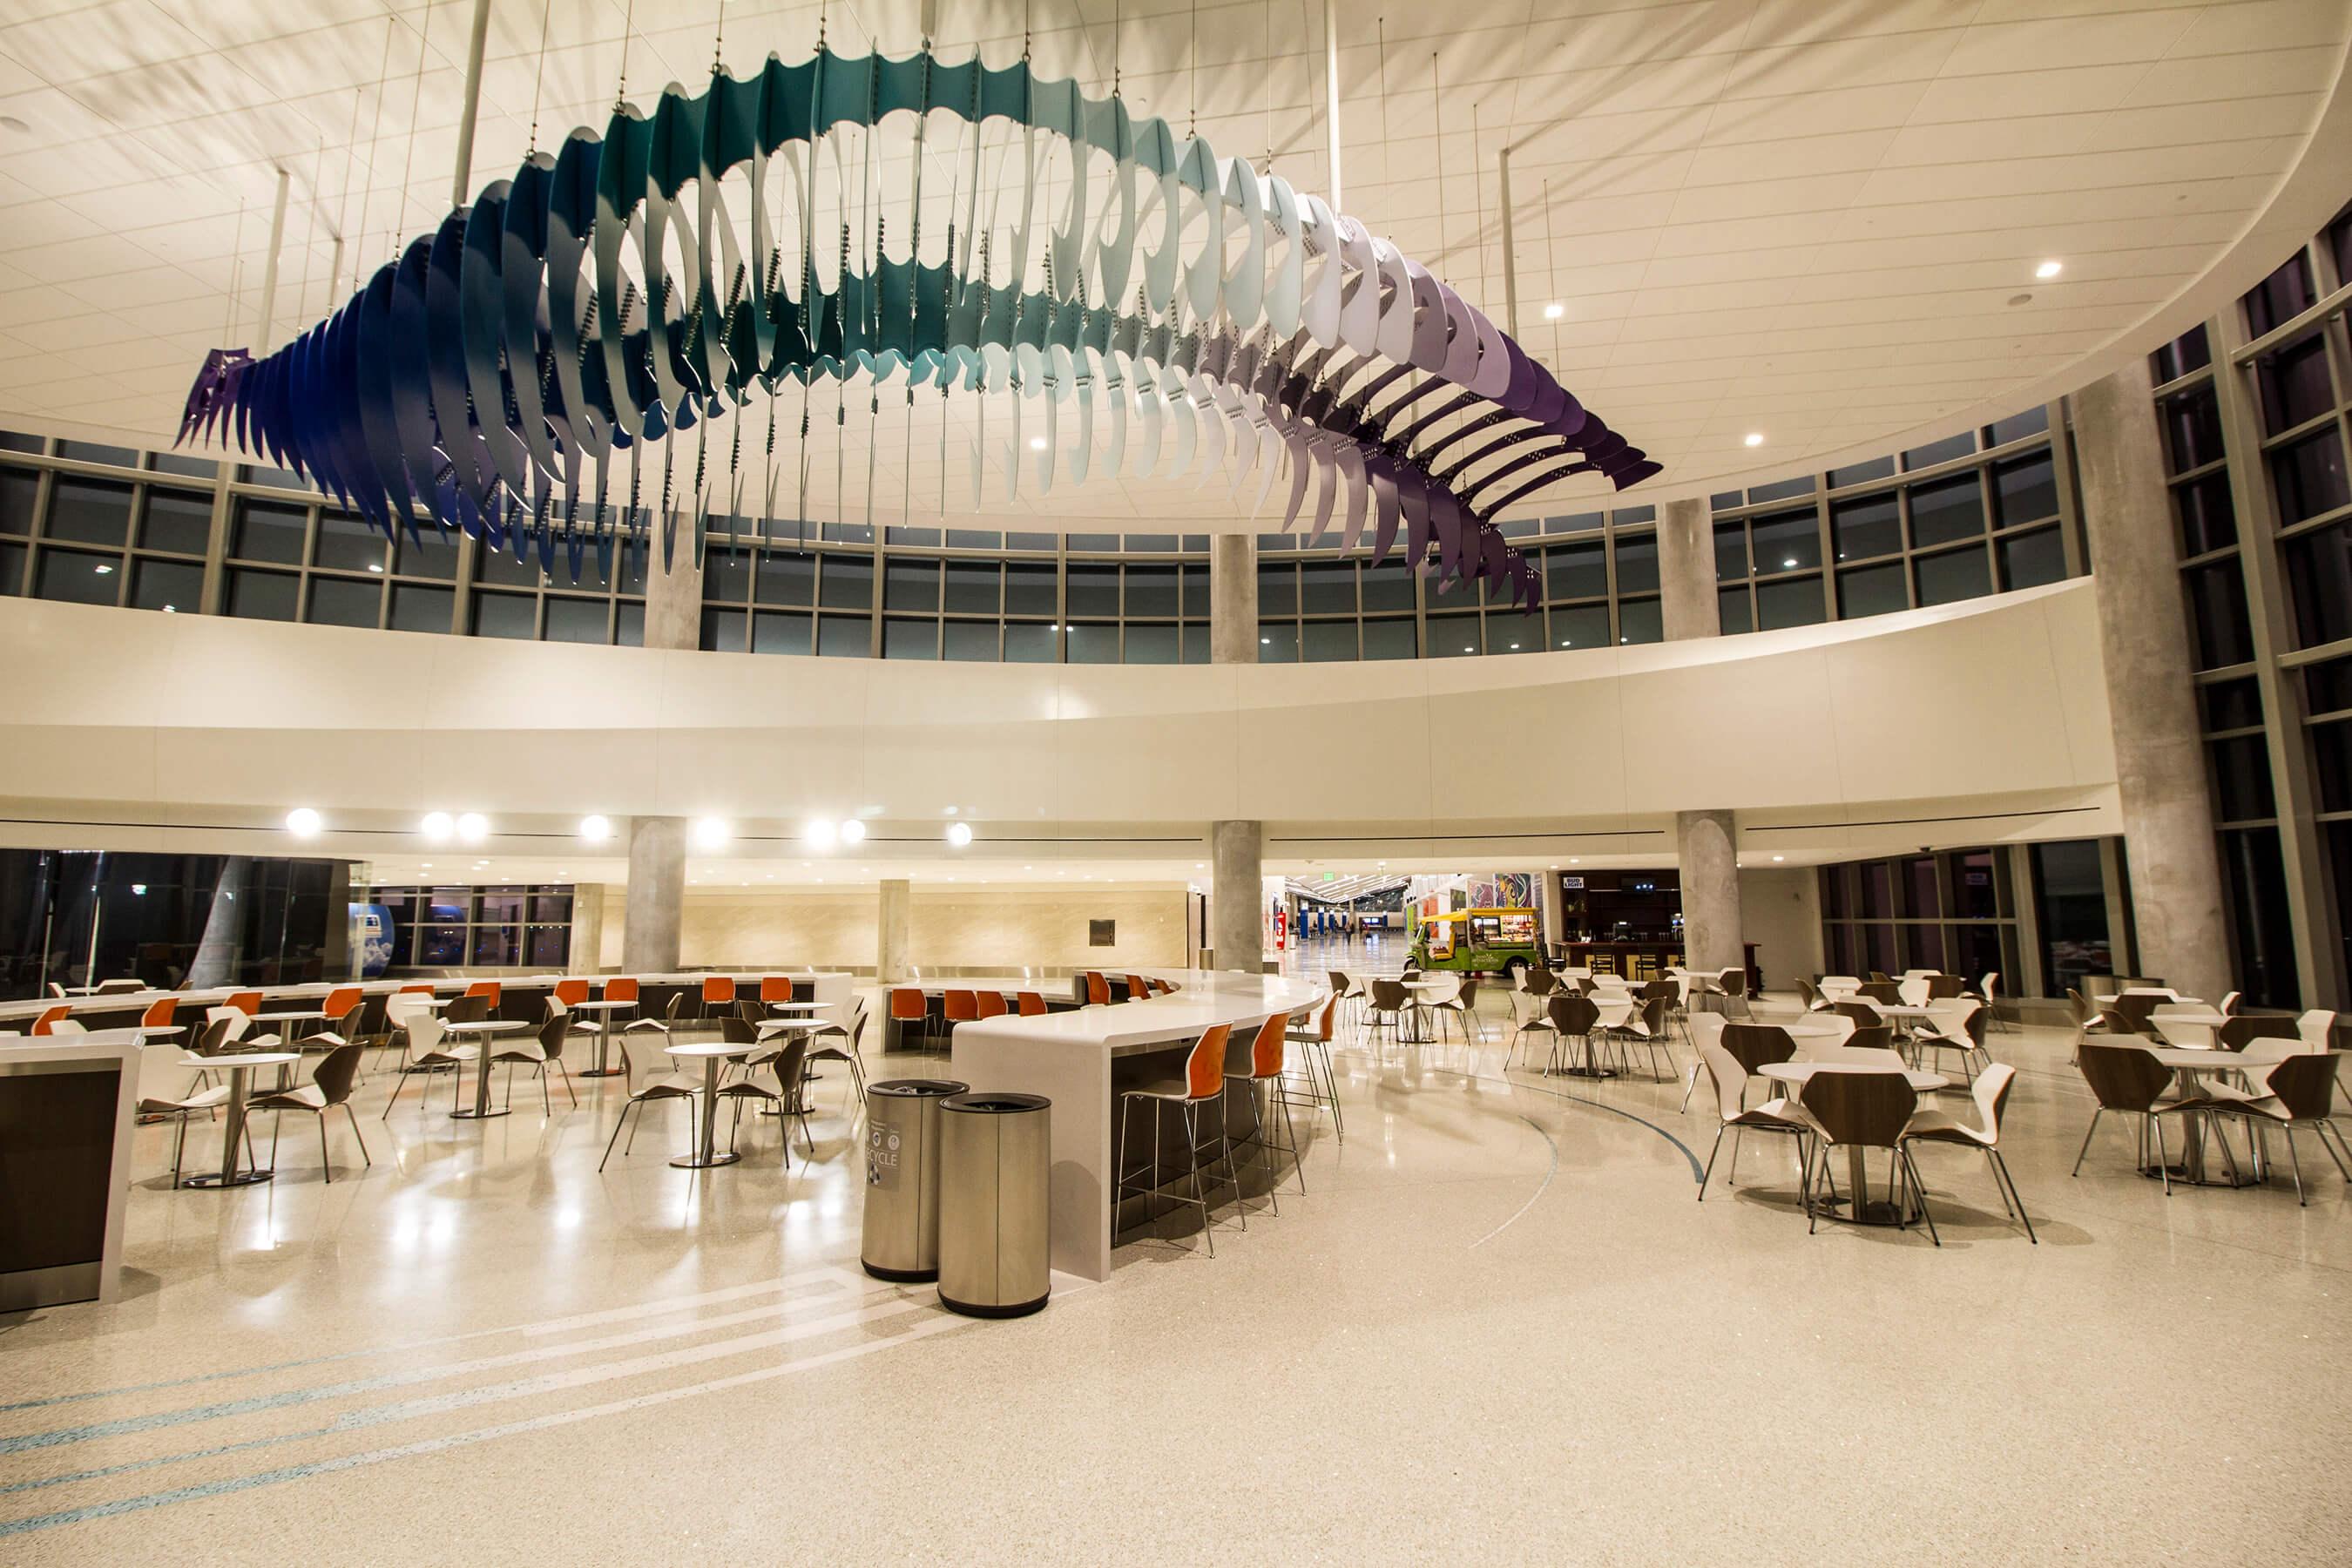 Ft. Lauderdale International Airport 1